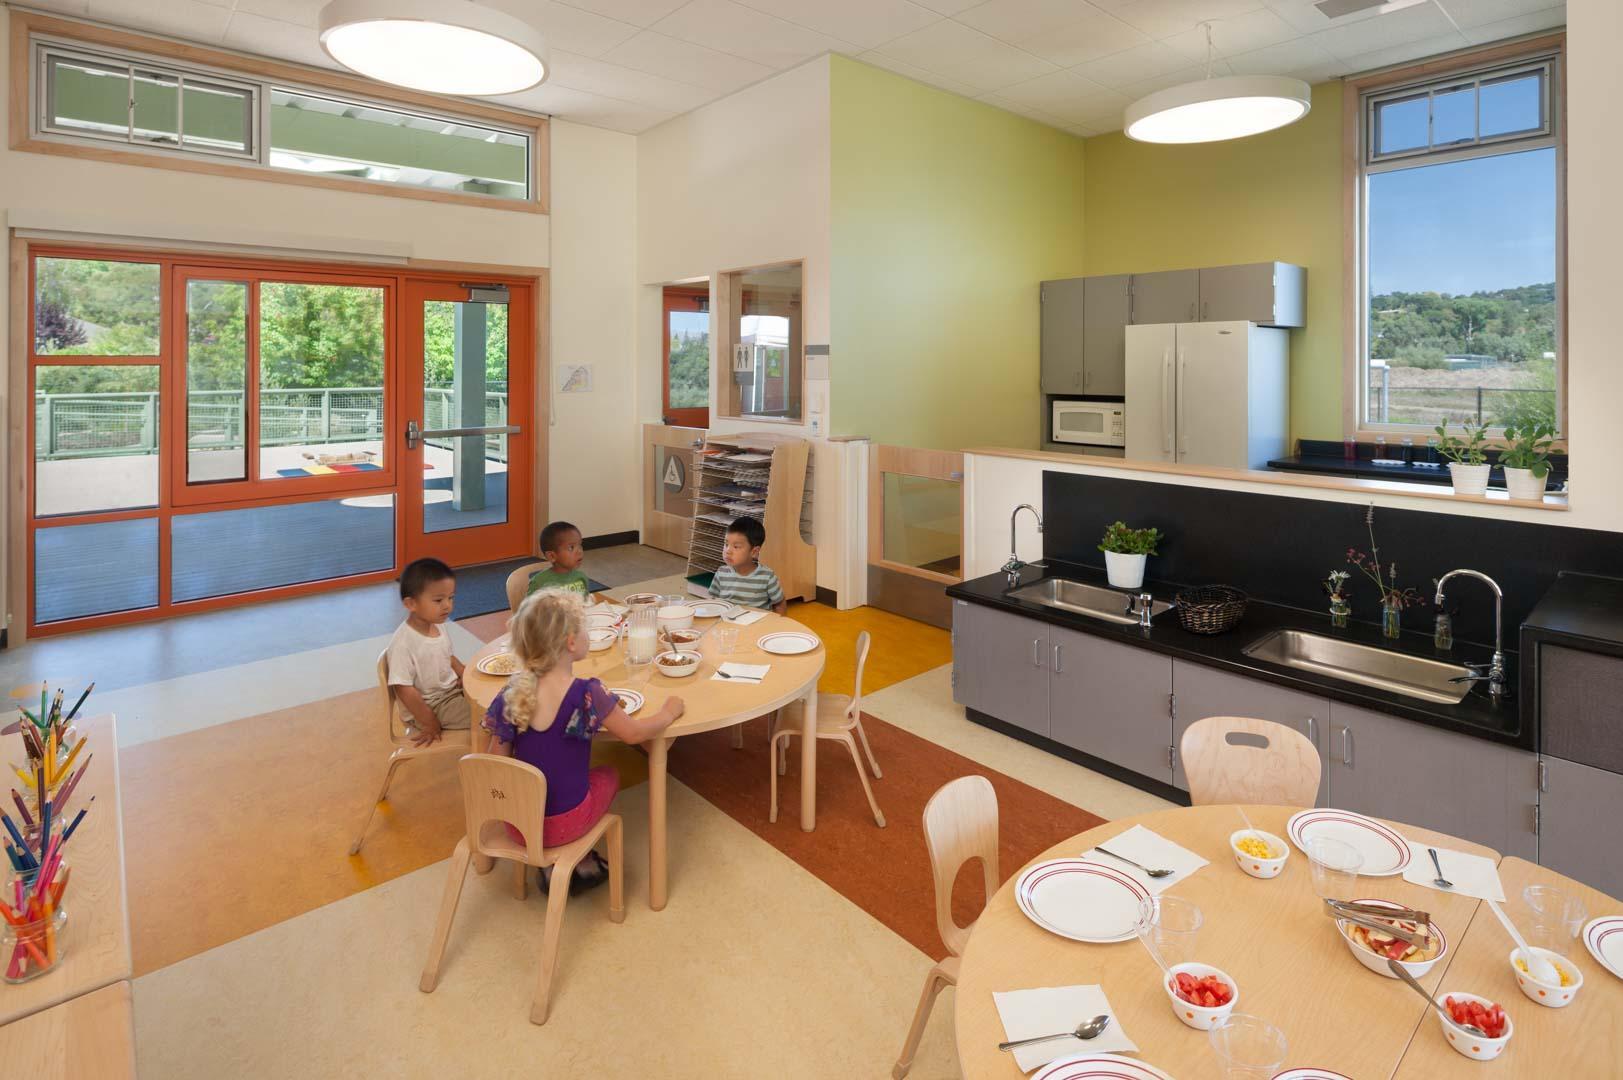 The San Francisco School Community Center